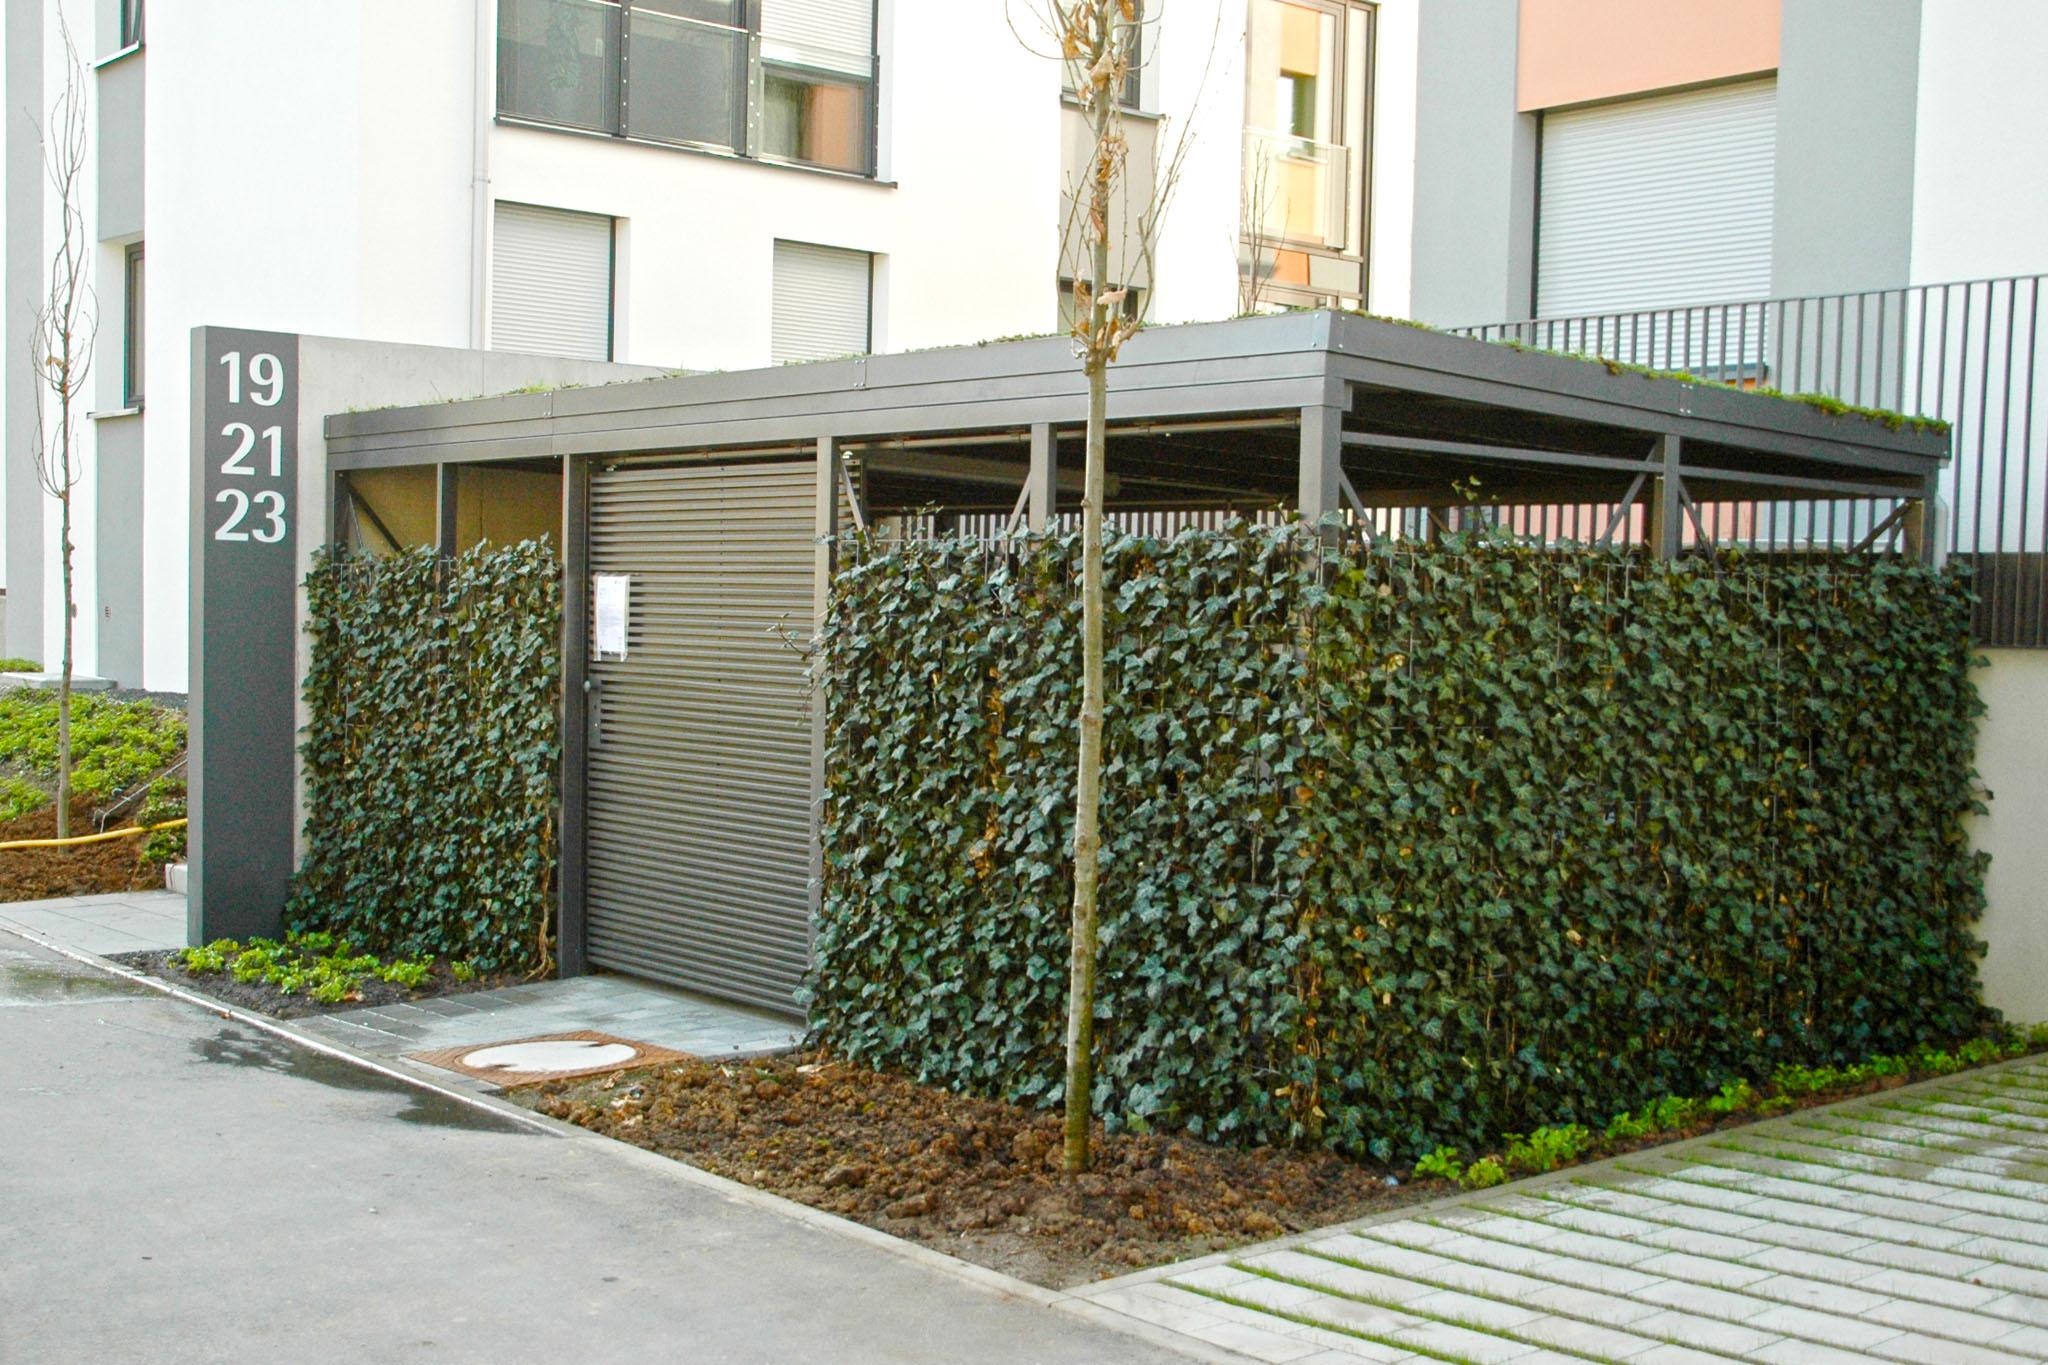 halm m llplatz helix pflanzen. Black Bedroom Furniture Sets. Home Design Ideas